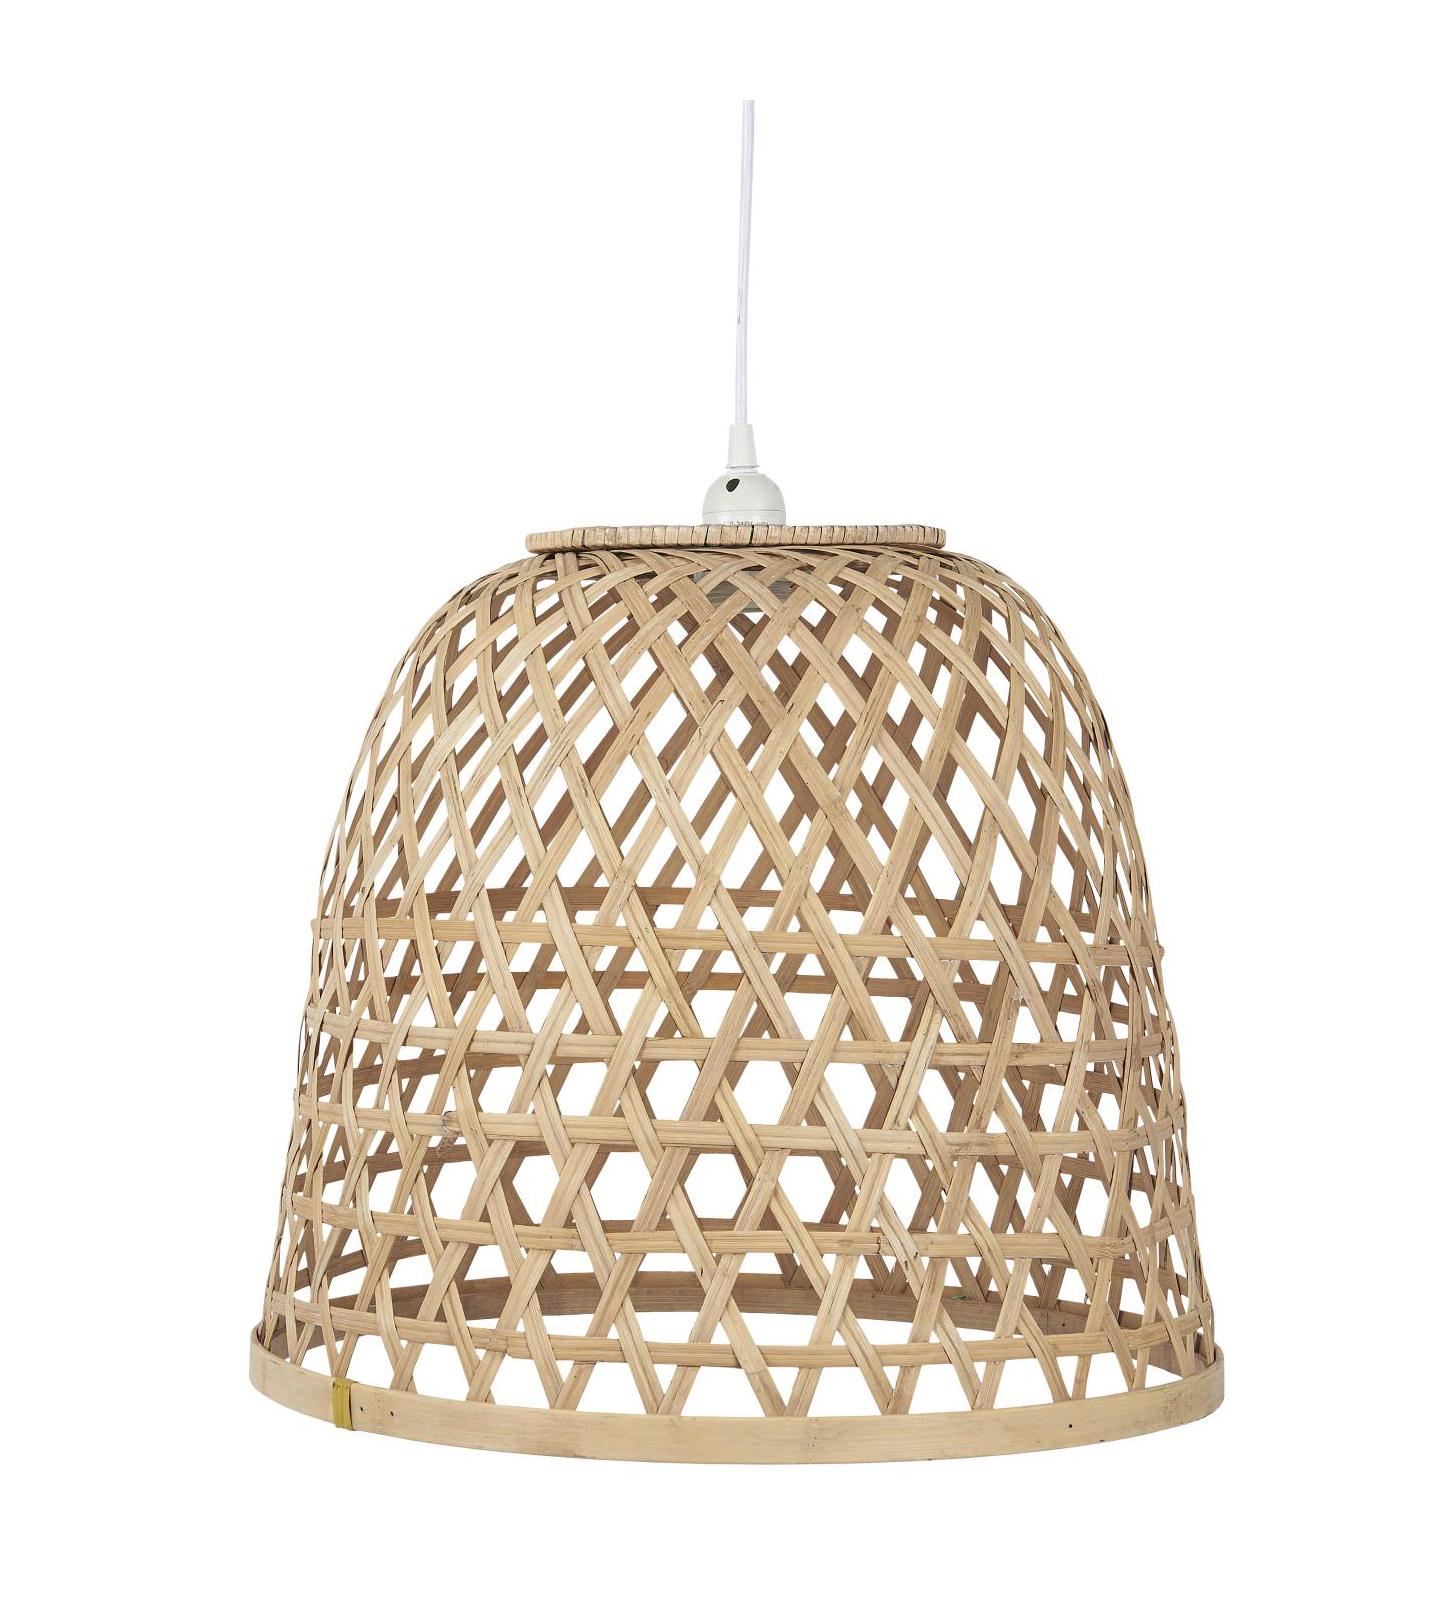 Forskellige Bambus lampe stor Ib Laursen - Little Village People SG36